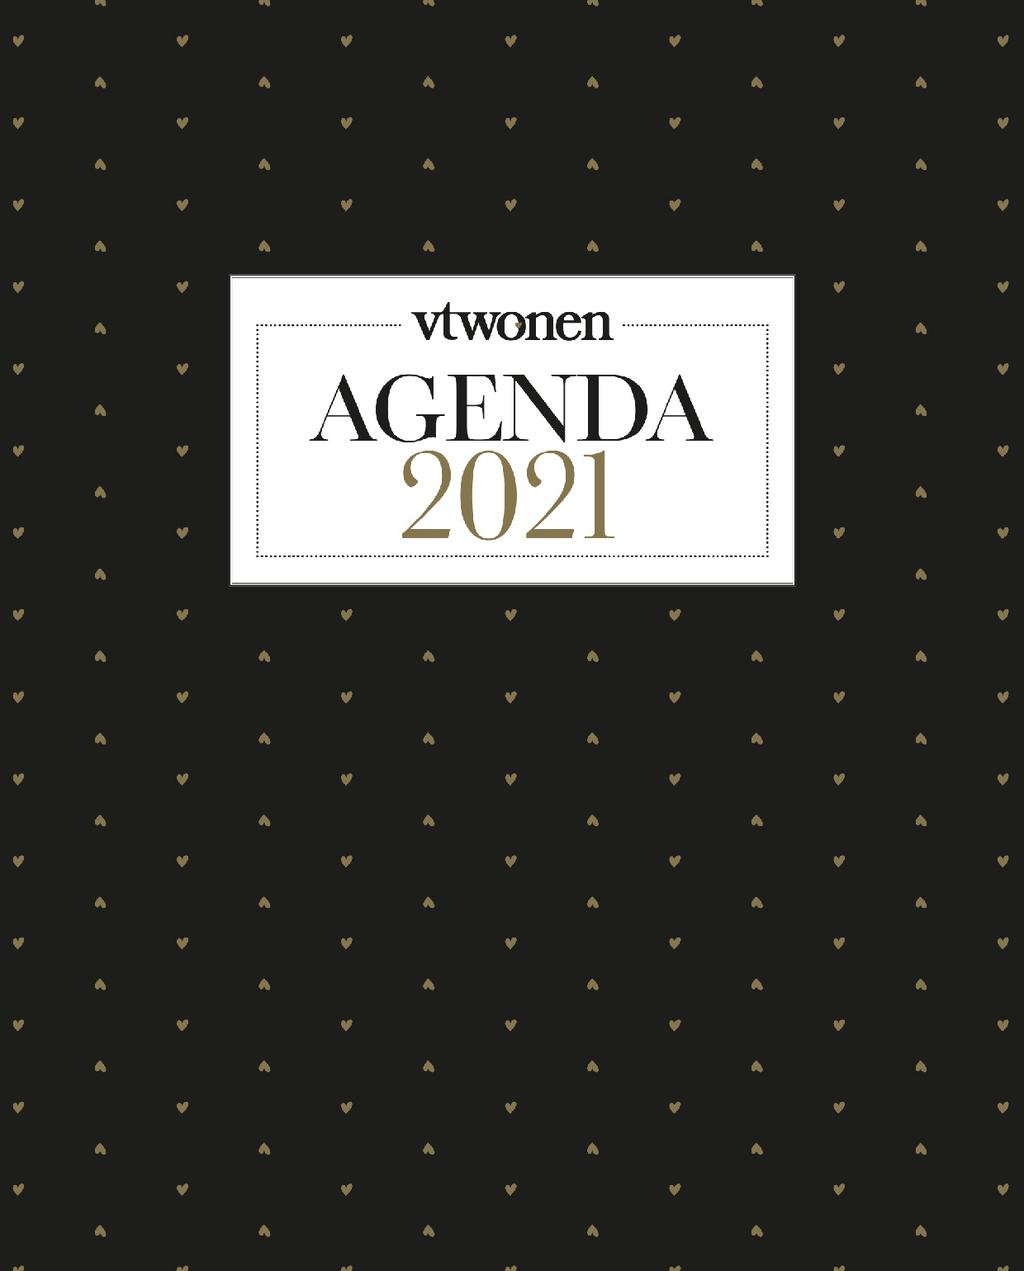 vtwonen agenda 2021